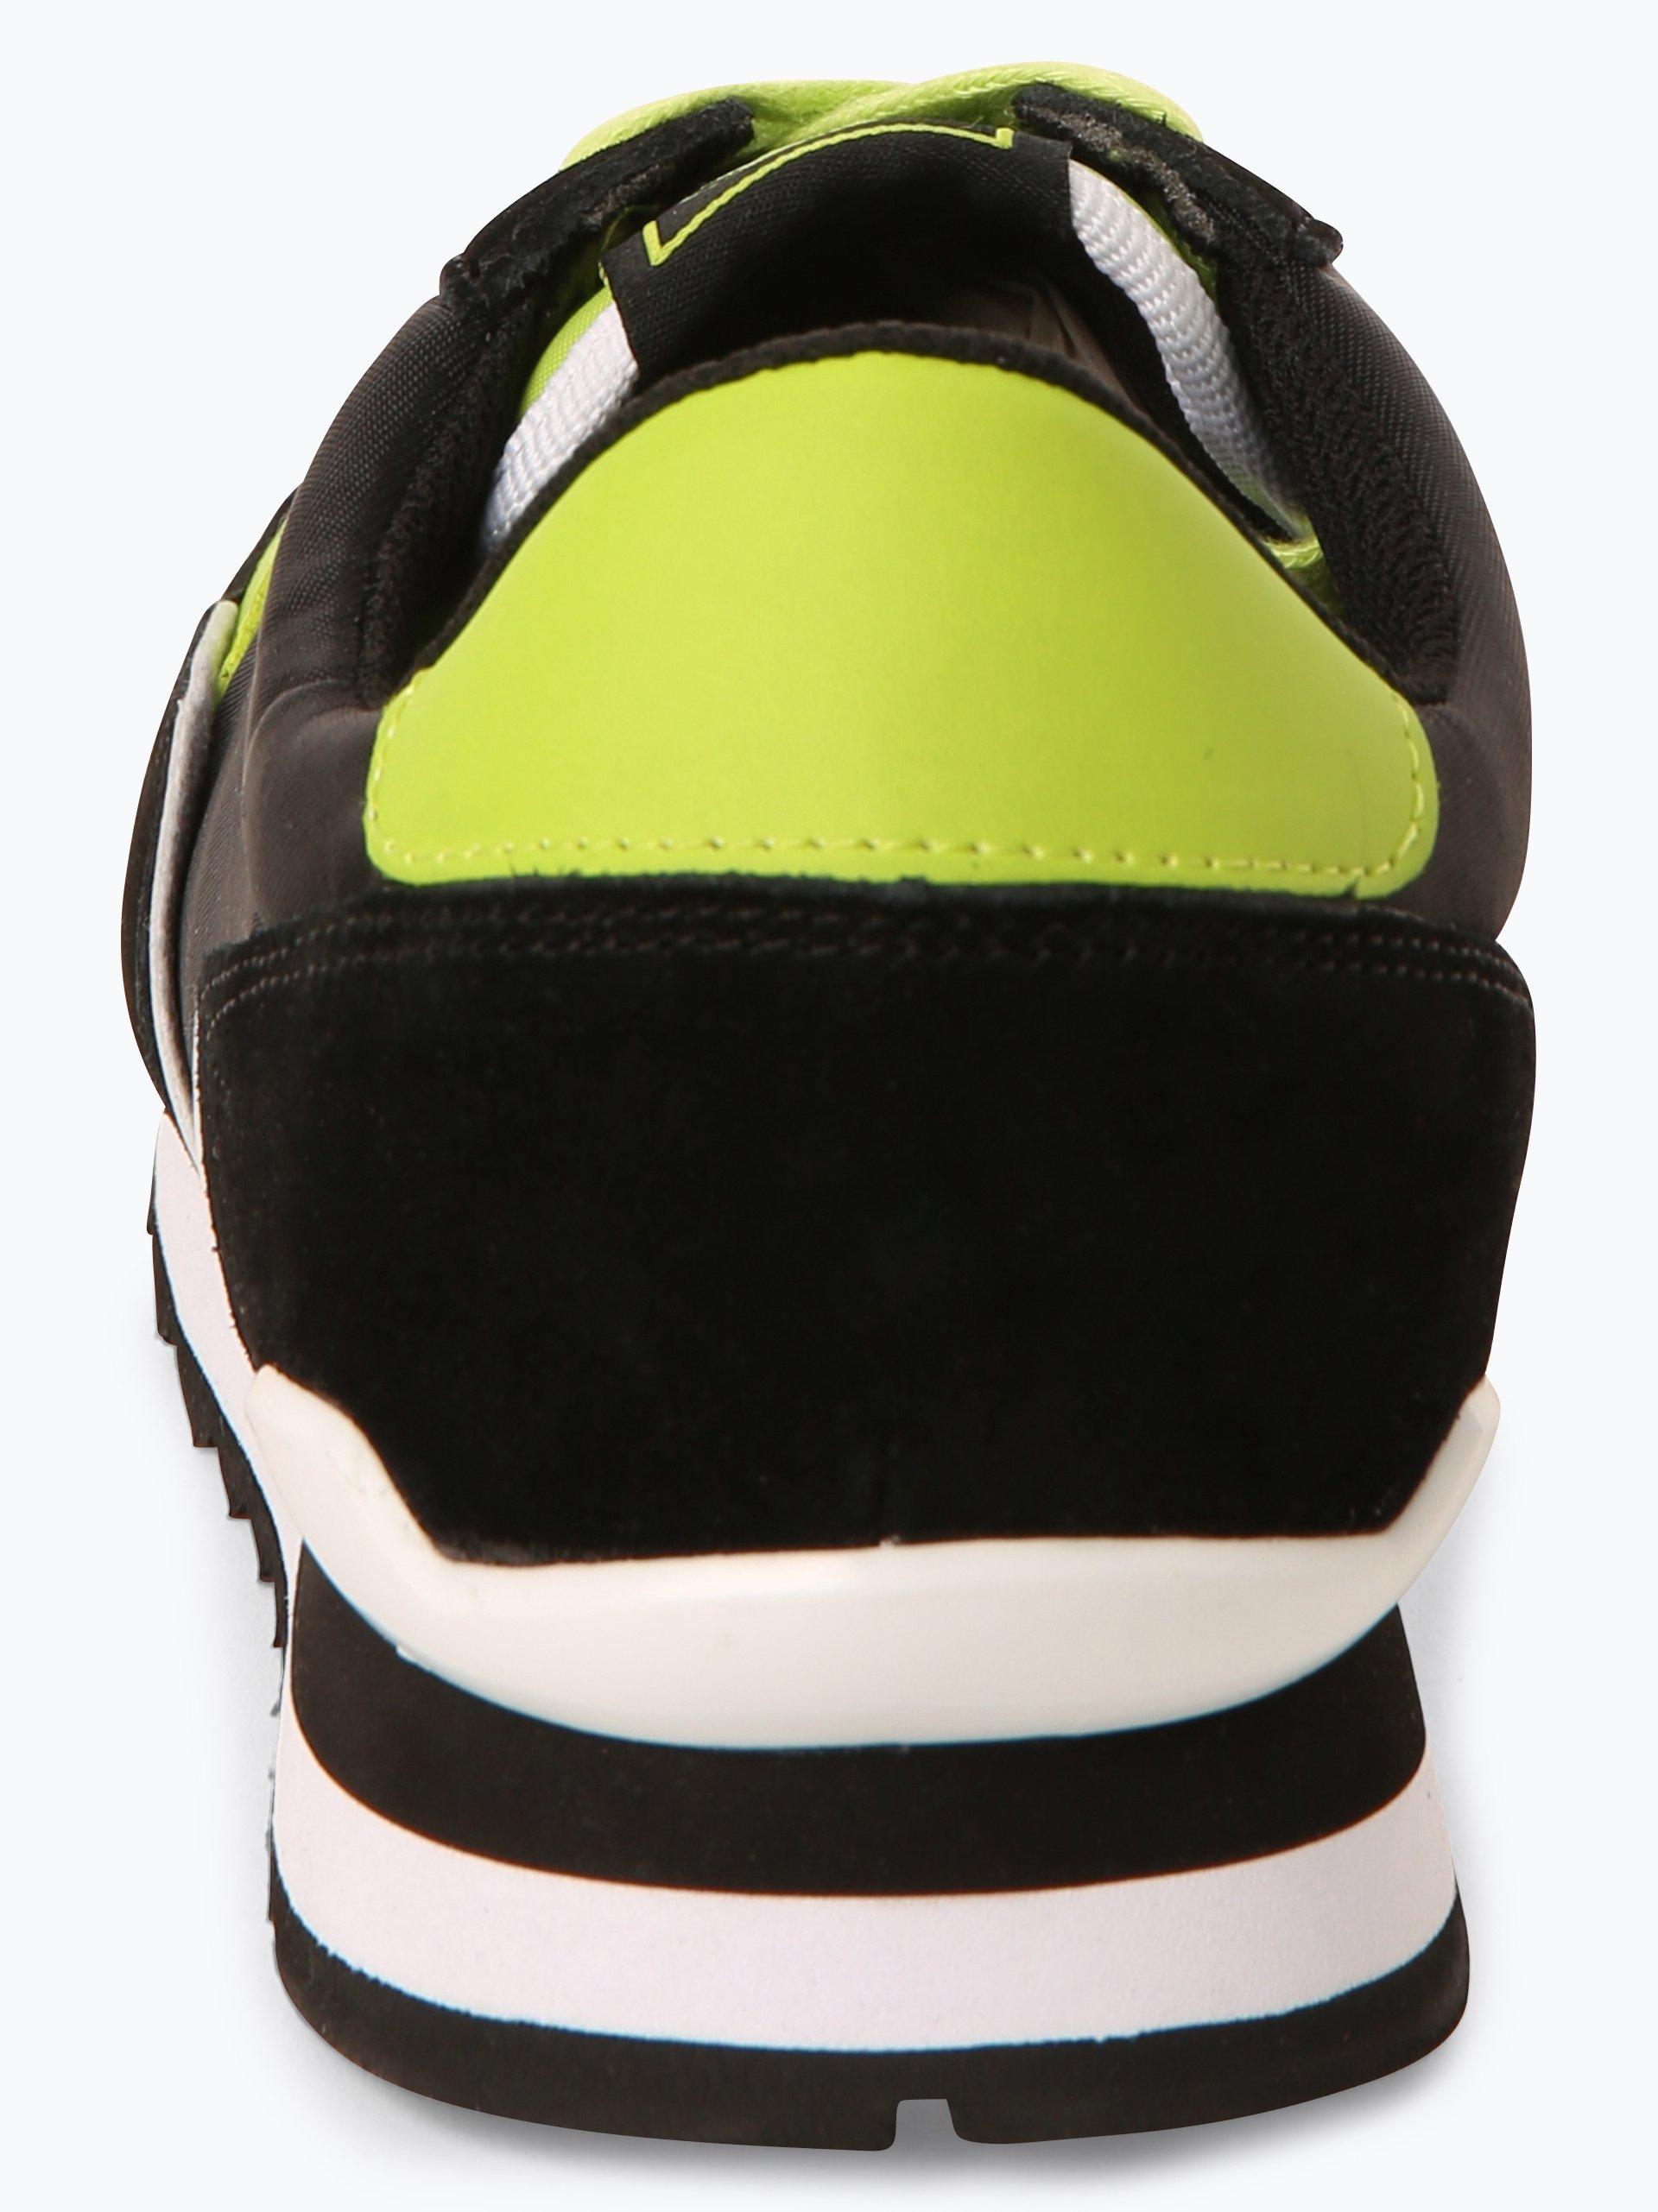 Trussadi Jeans Herren Sneaker mit Leder-Anteil